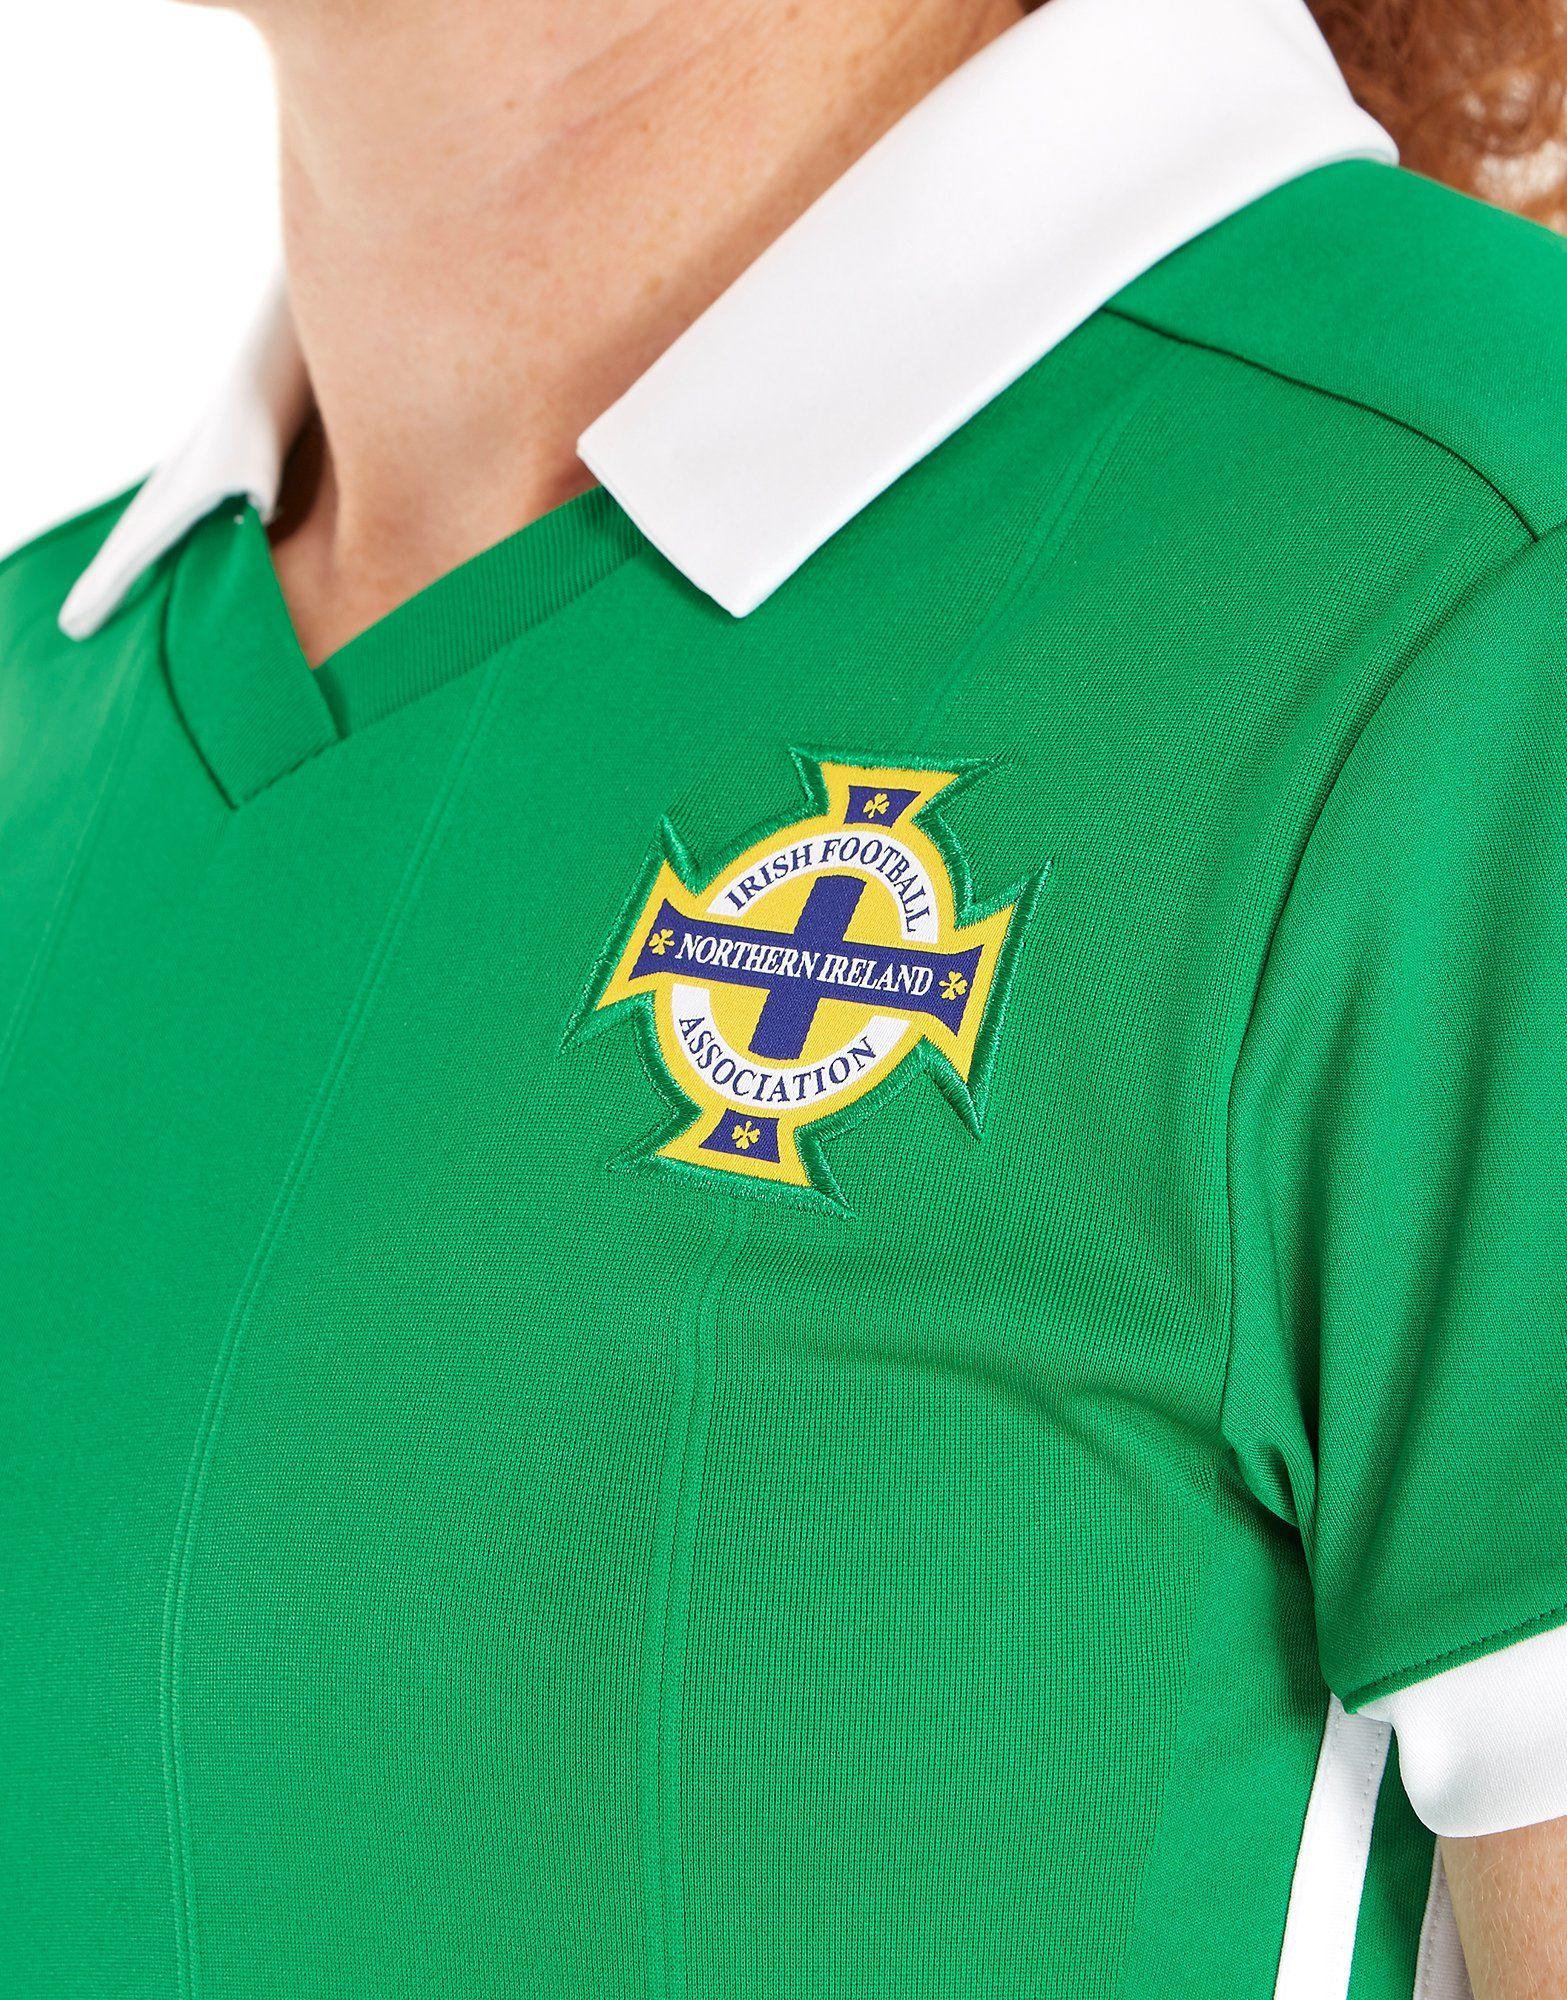 adidas Northern Ireland 2018/19 Home Shirt Women's